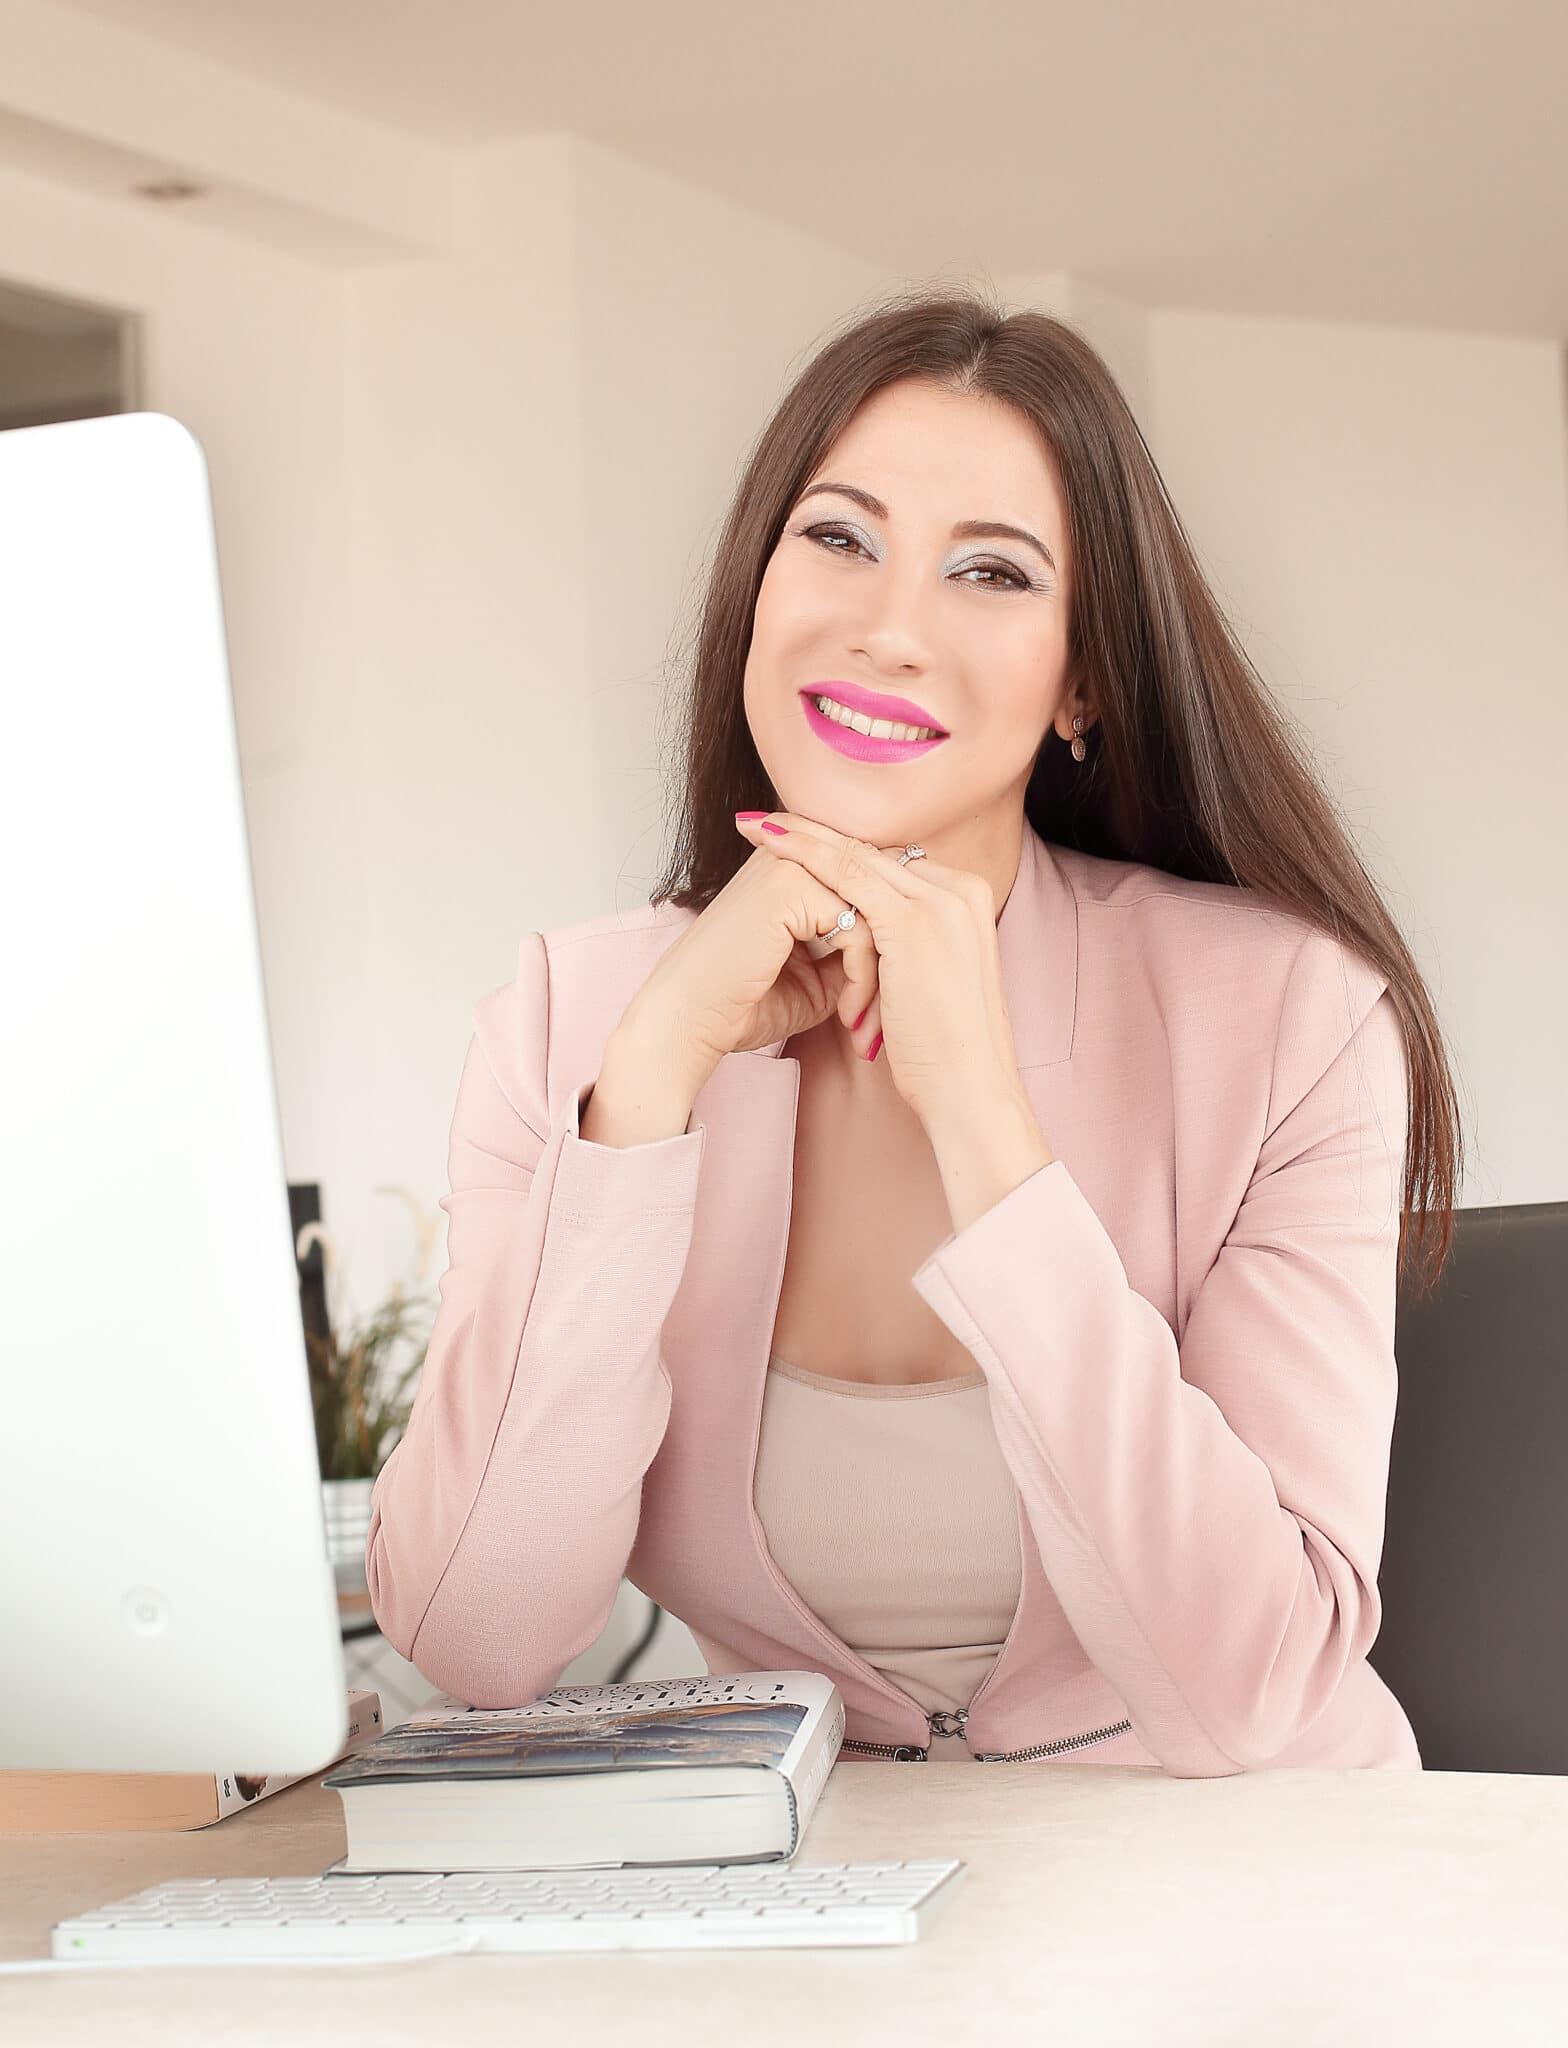 Дарья Андреевна Шанс